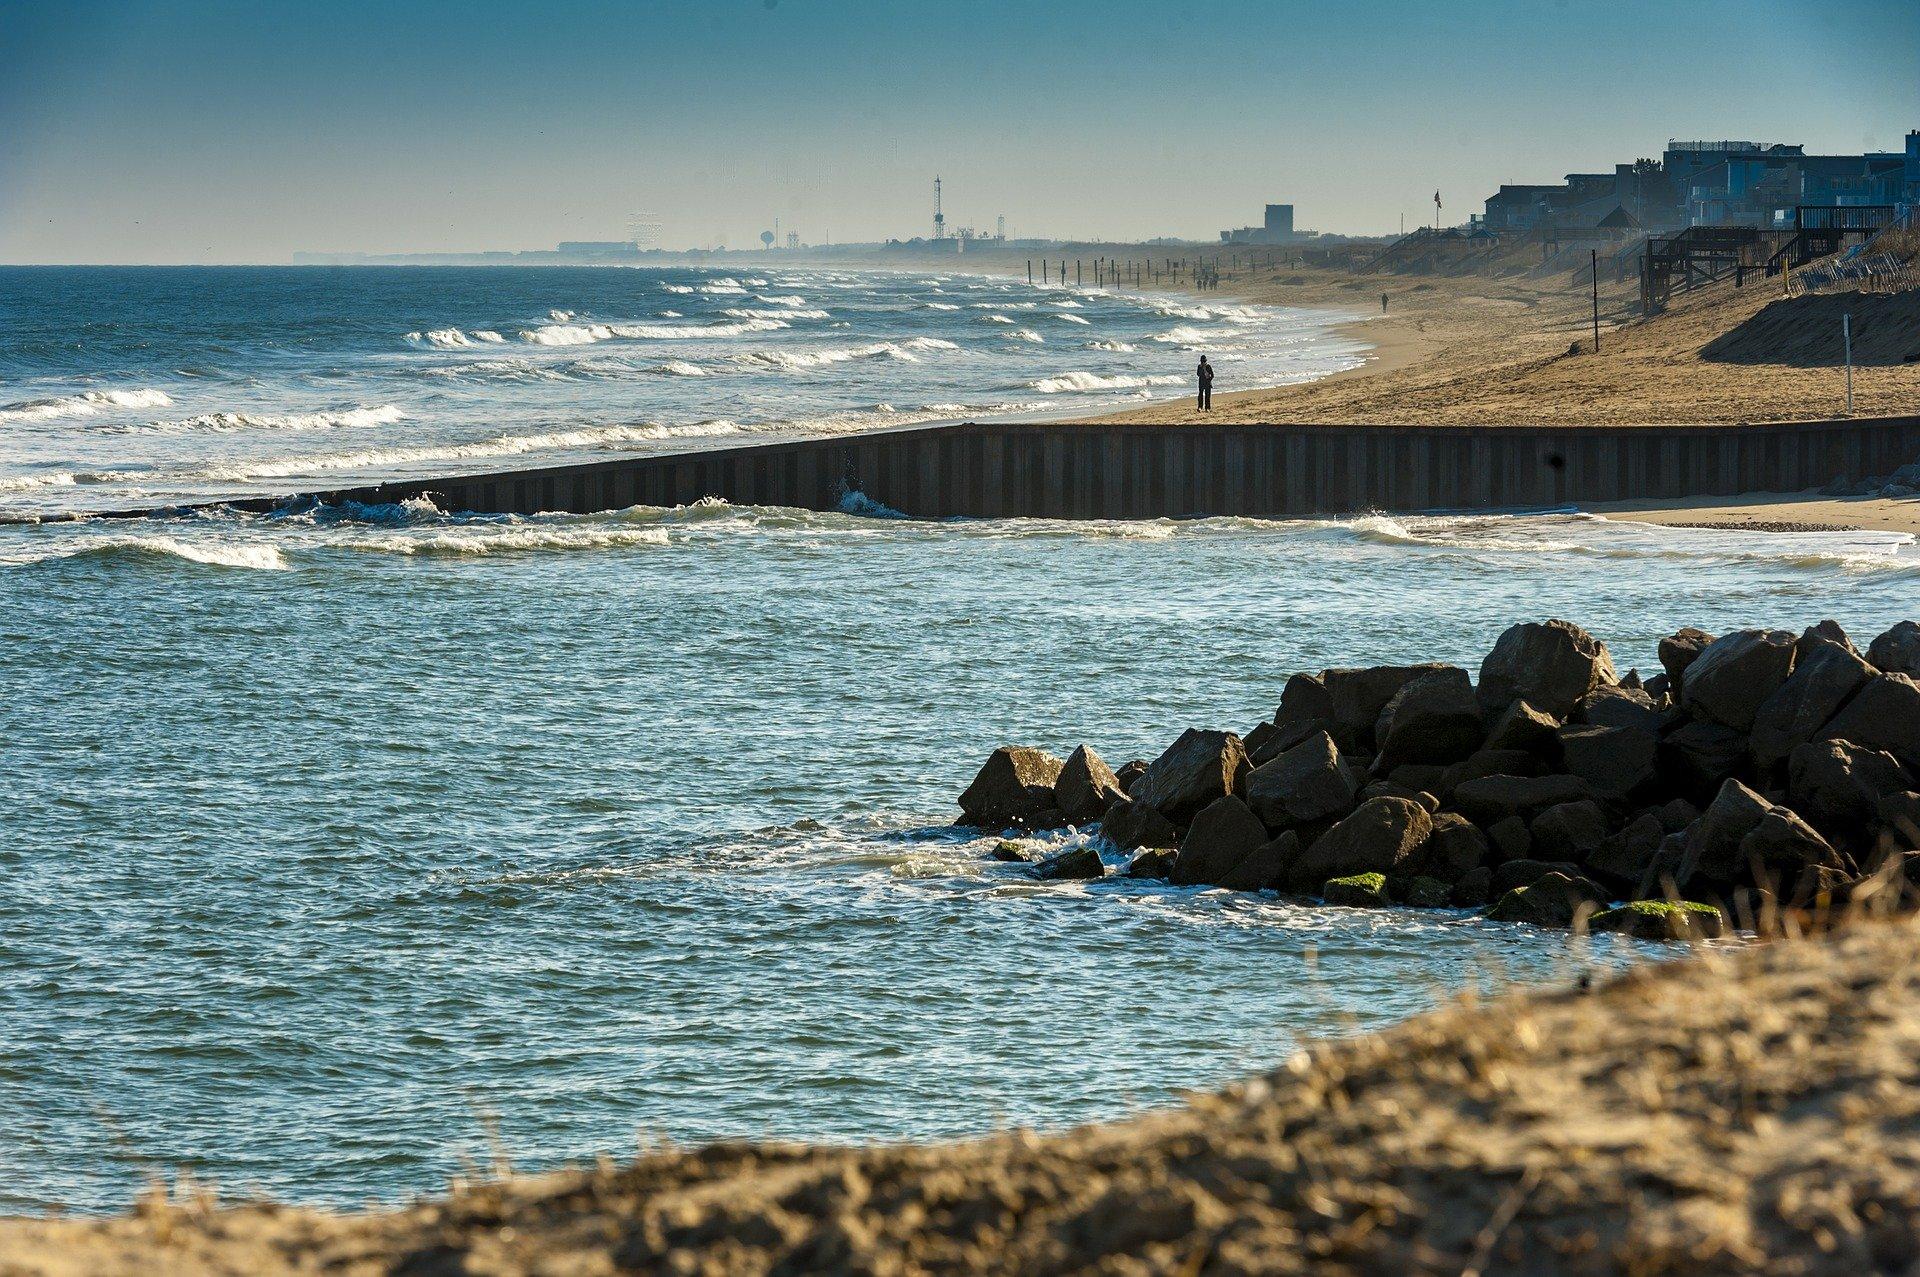 virginia-beach-3501704_1920